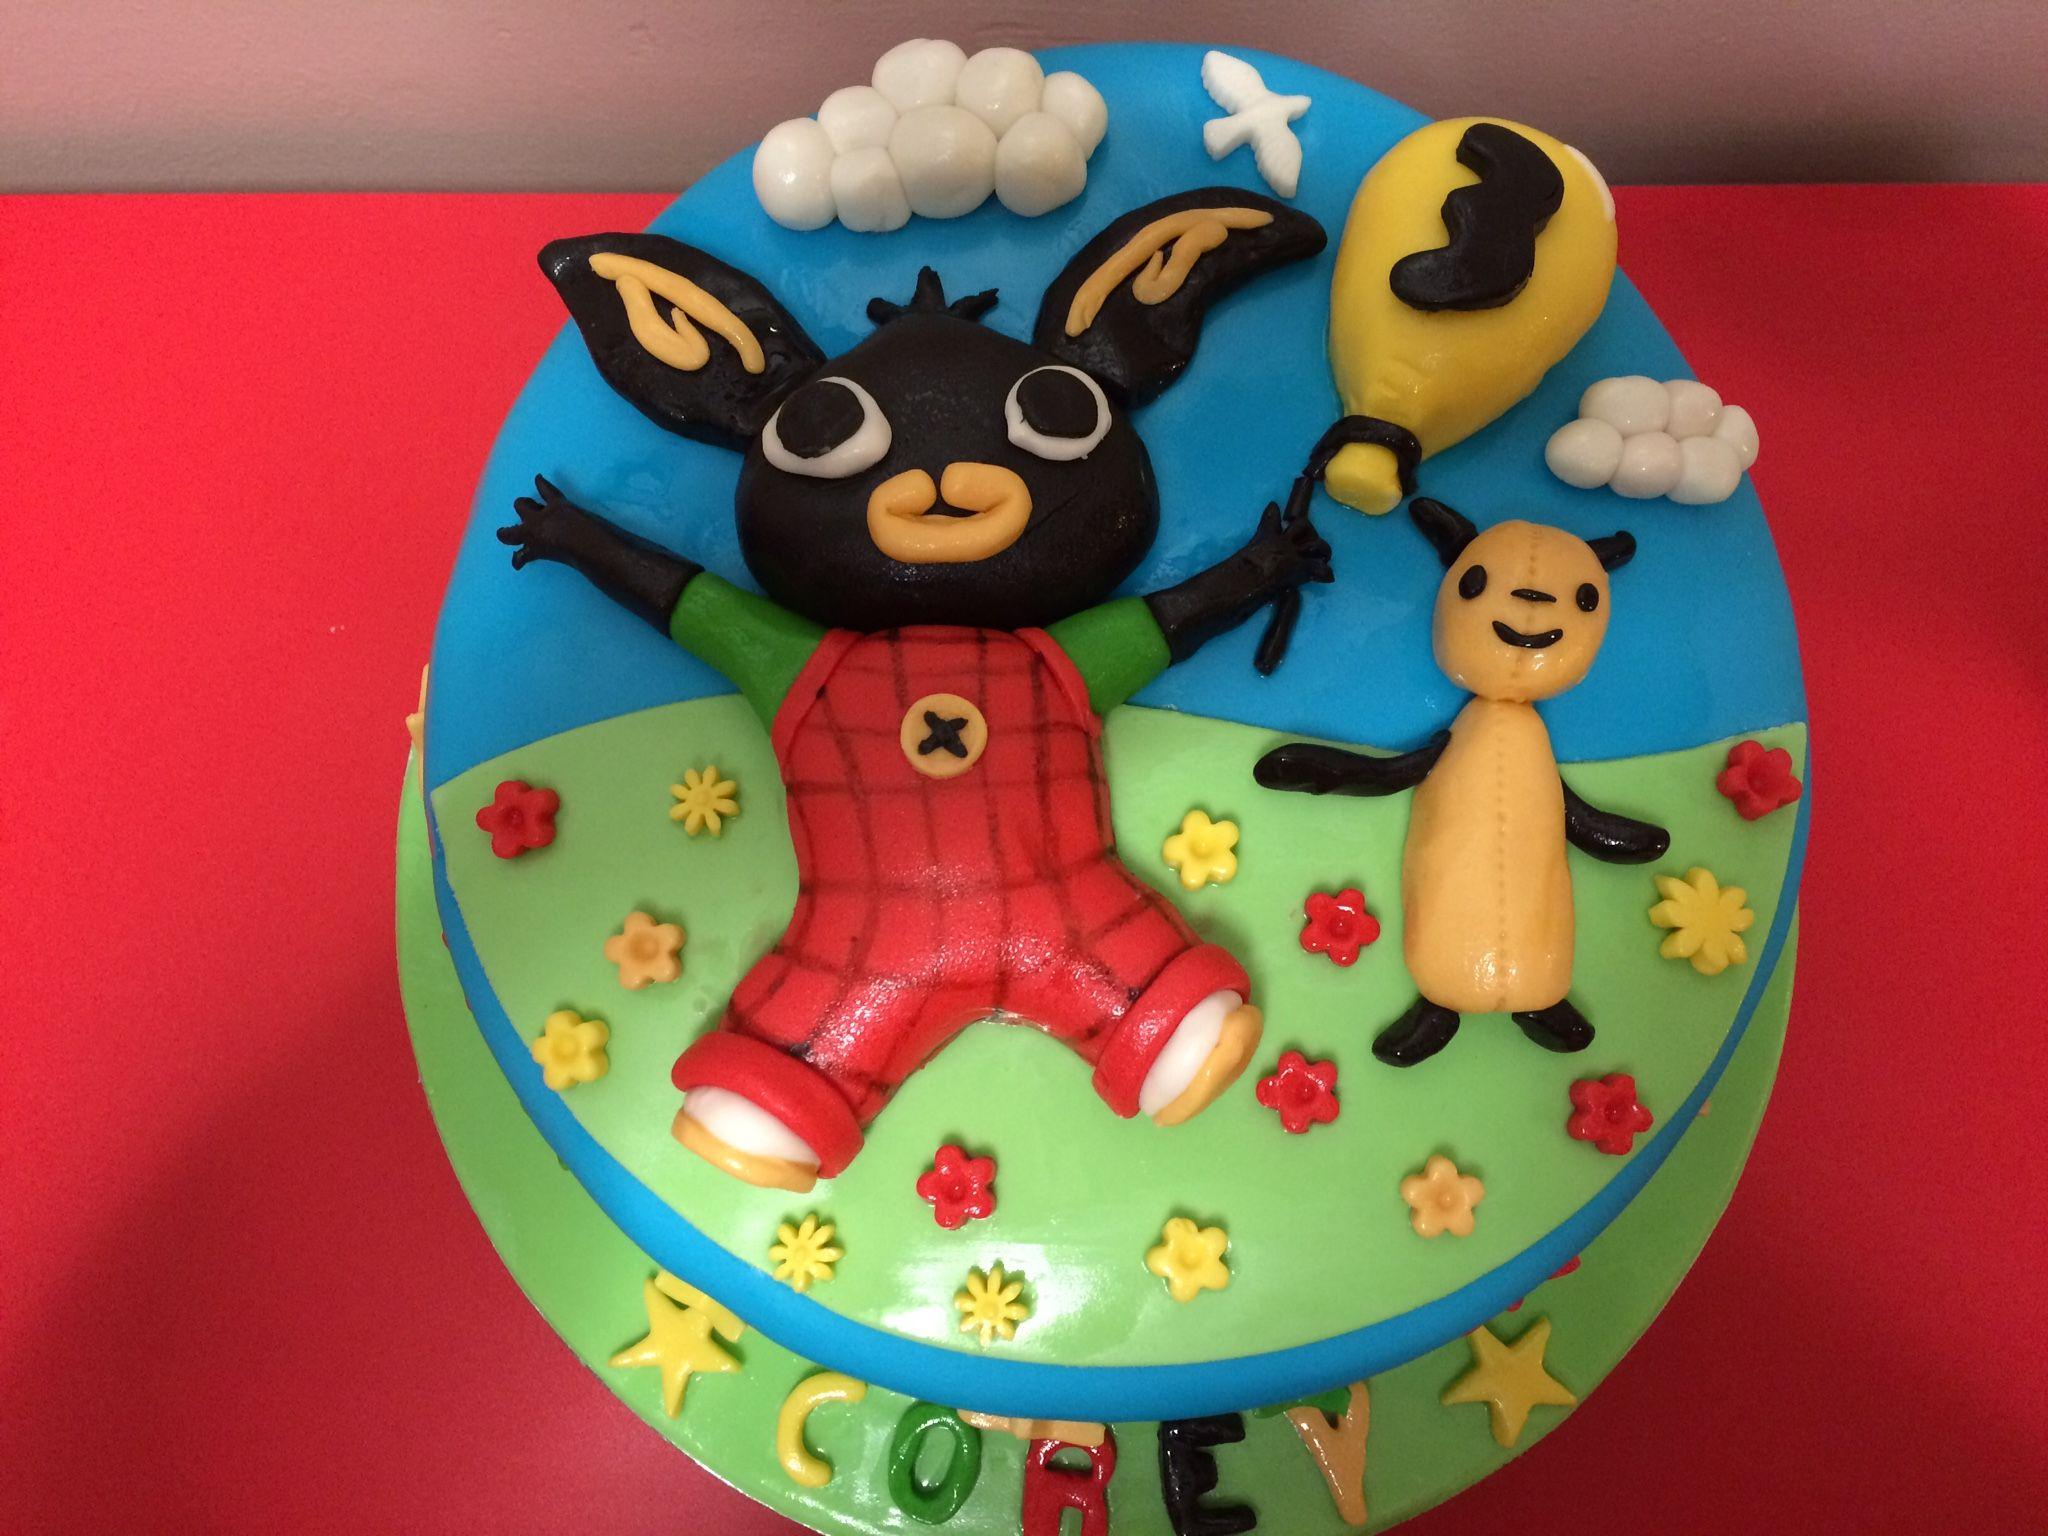 Bing bunny cake Shazscakesofchepstowweeblycom Households